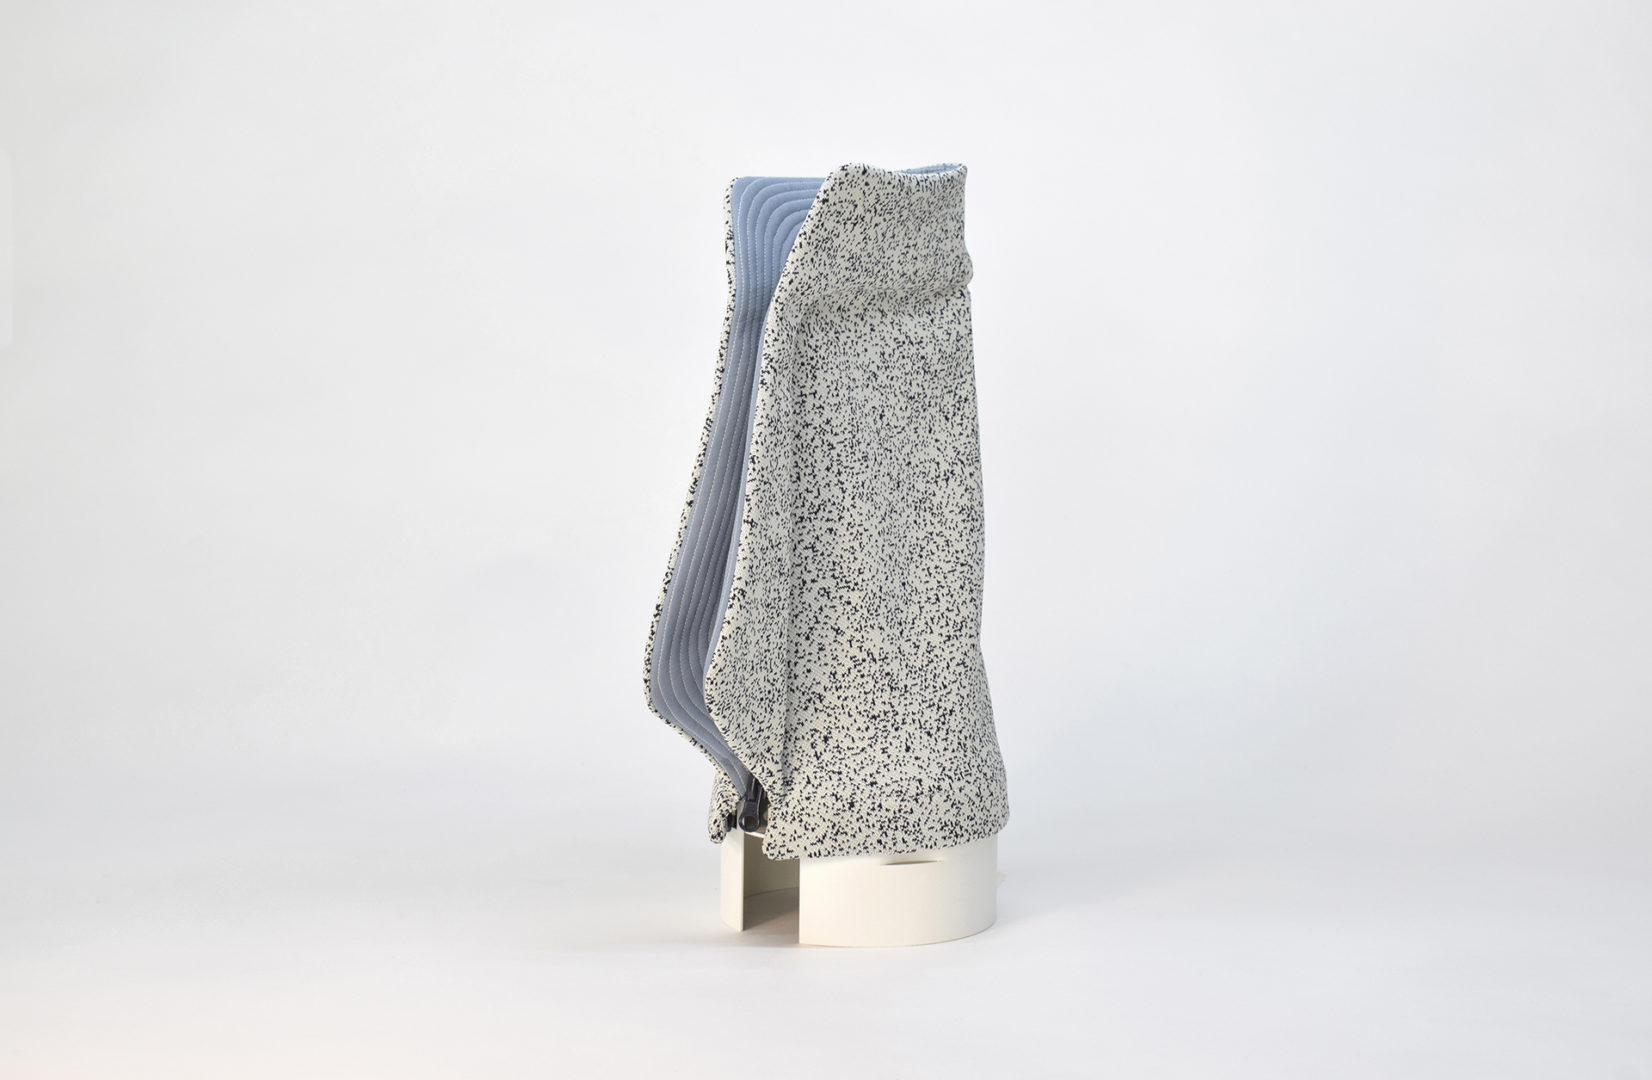 Muette-lamp-white-Yvan-Caillaud-3